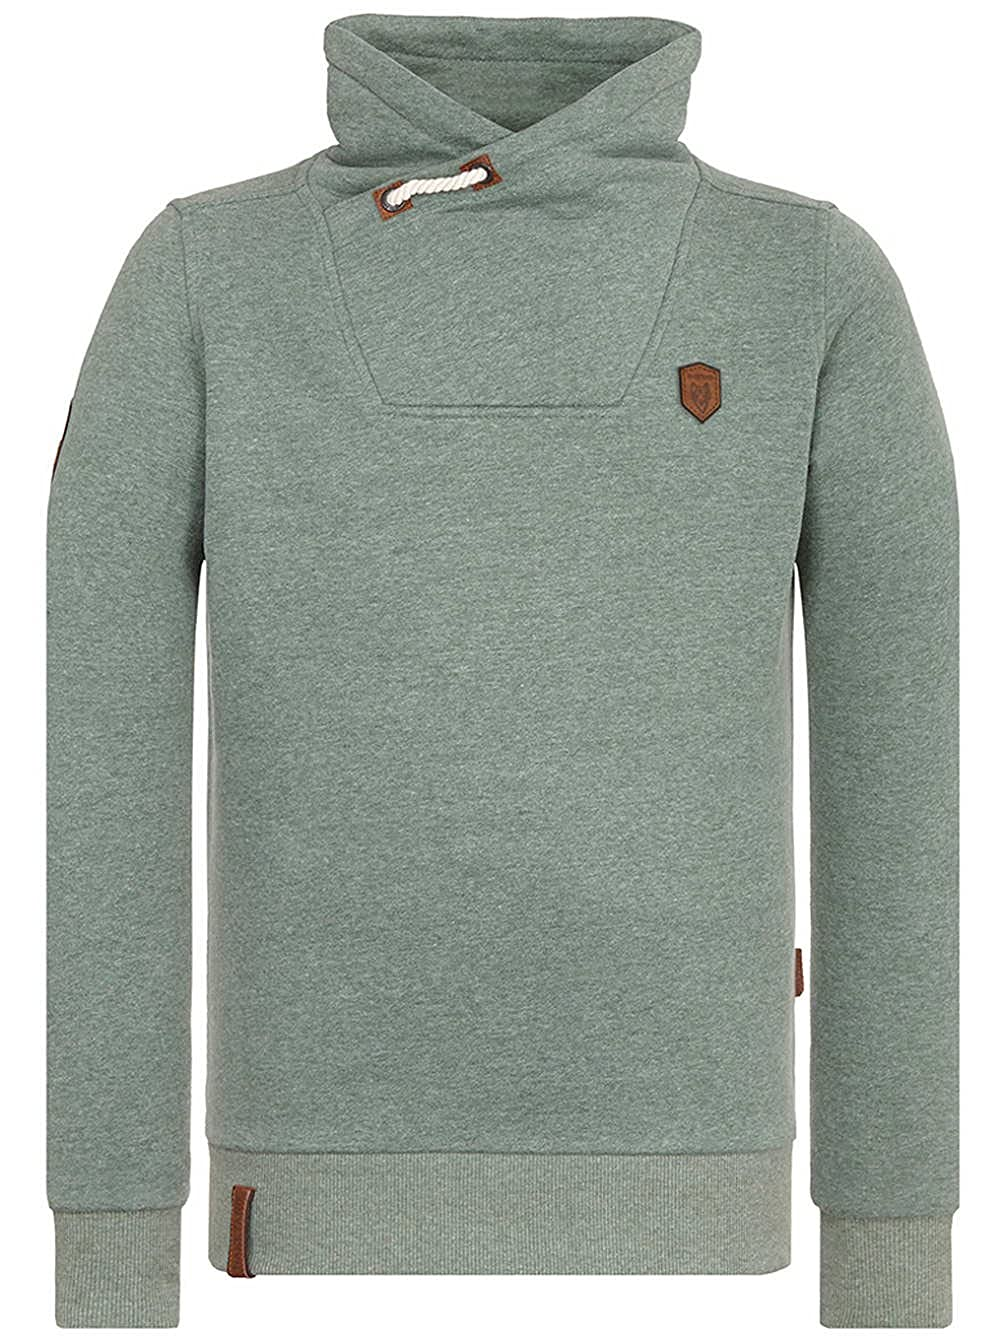 Naketano Congenialer Pimmel III Sweatshirt für Herren Grau